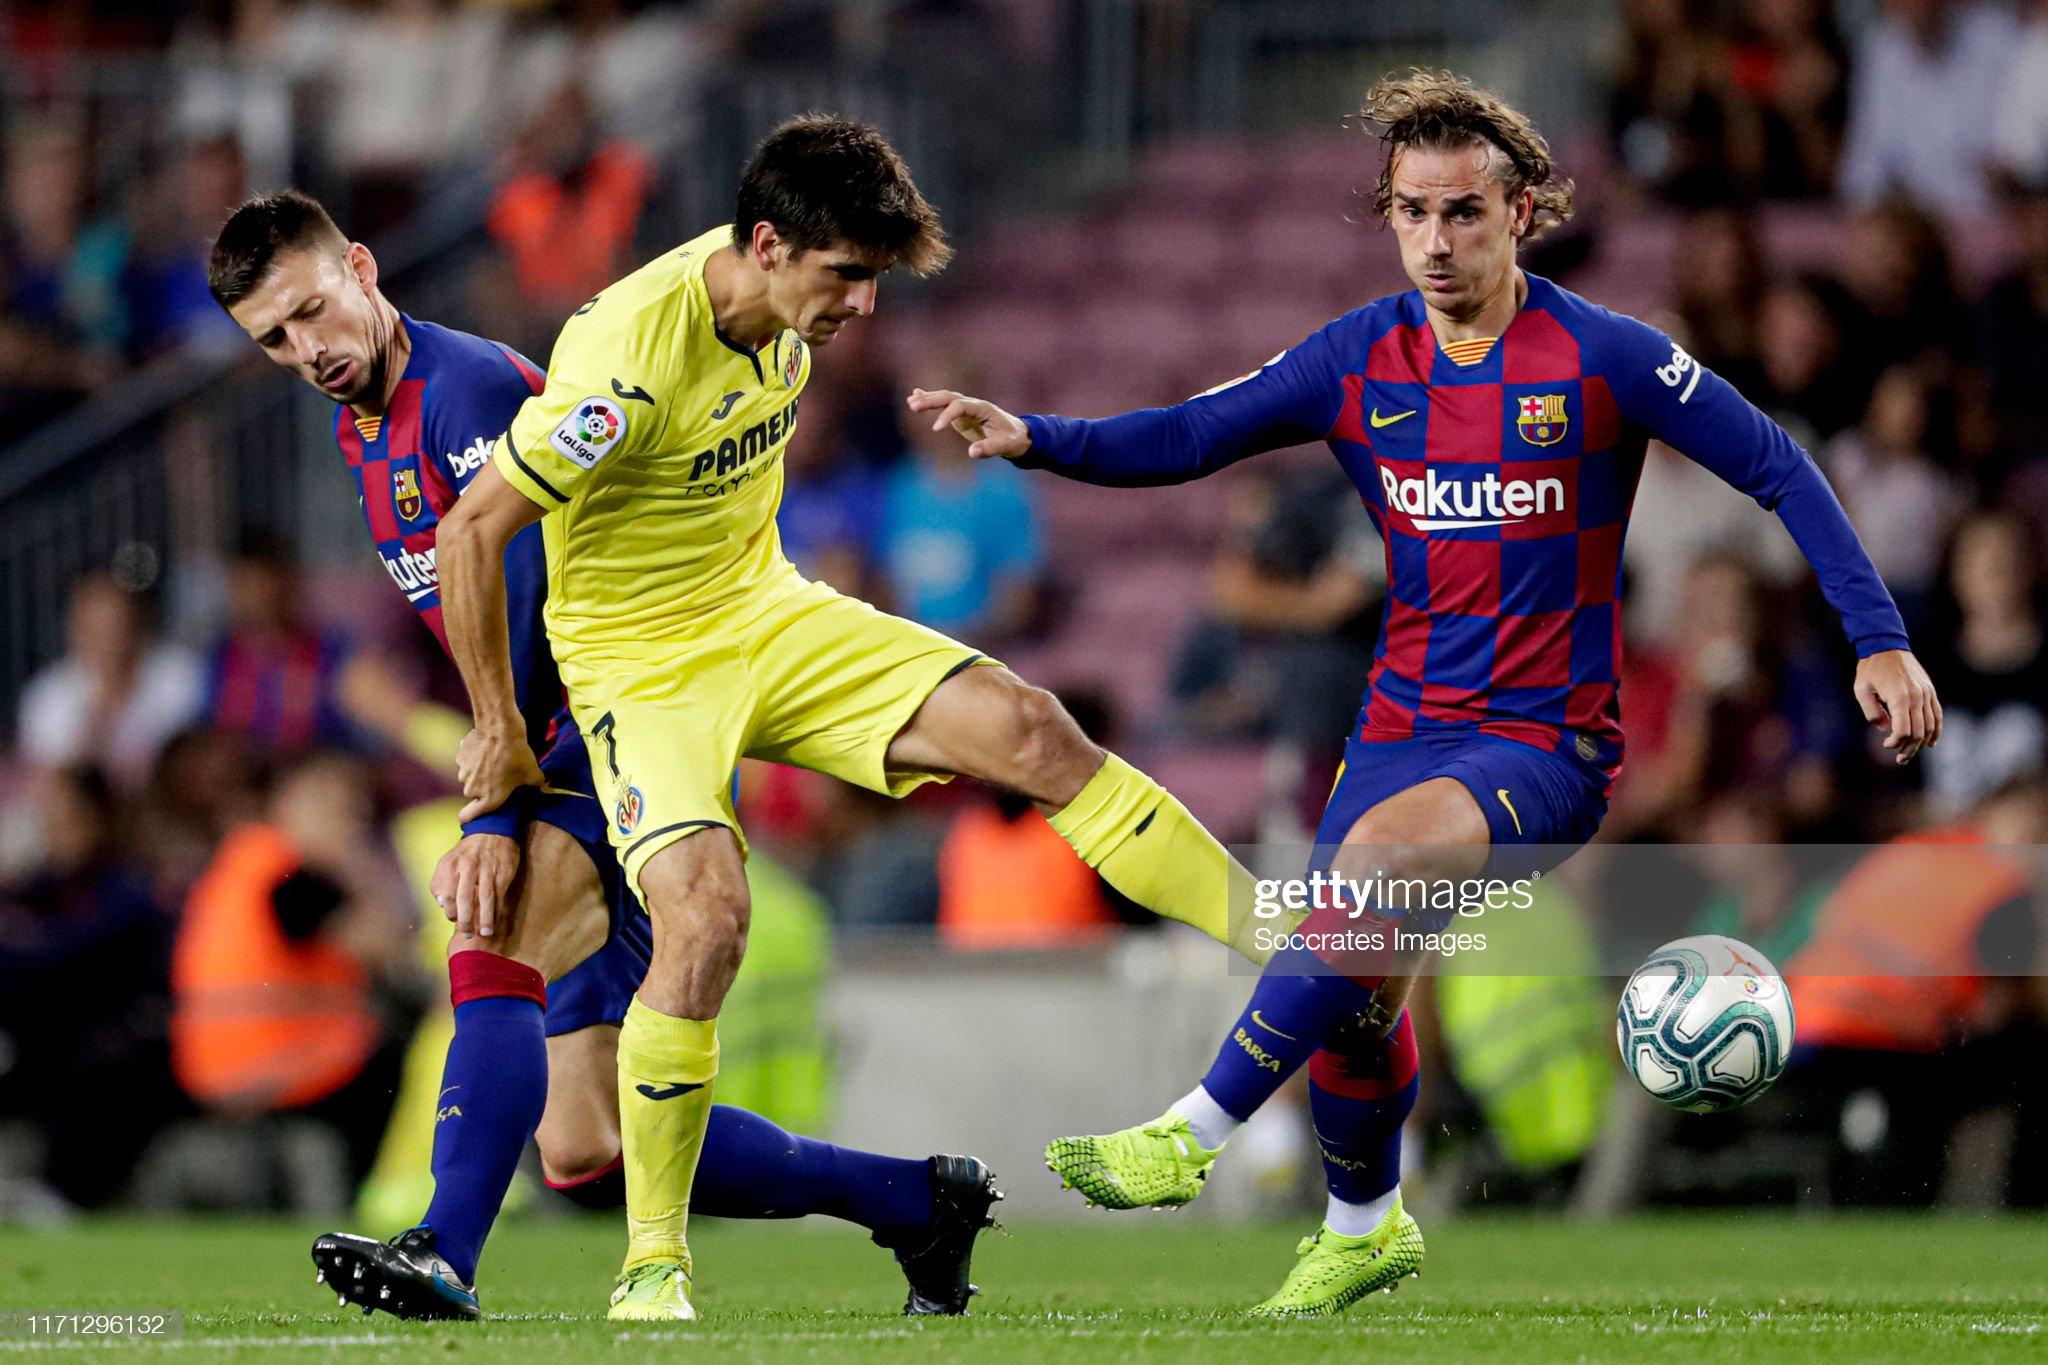 صور مباراة : برشلونة - فياريال 2-1 ( 24-09-2019 )  Clement-lenglet-of-fc-barcelona-gerard-moreno-of-villarreal-antoine-picture-id1171296132?s=2048x2048